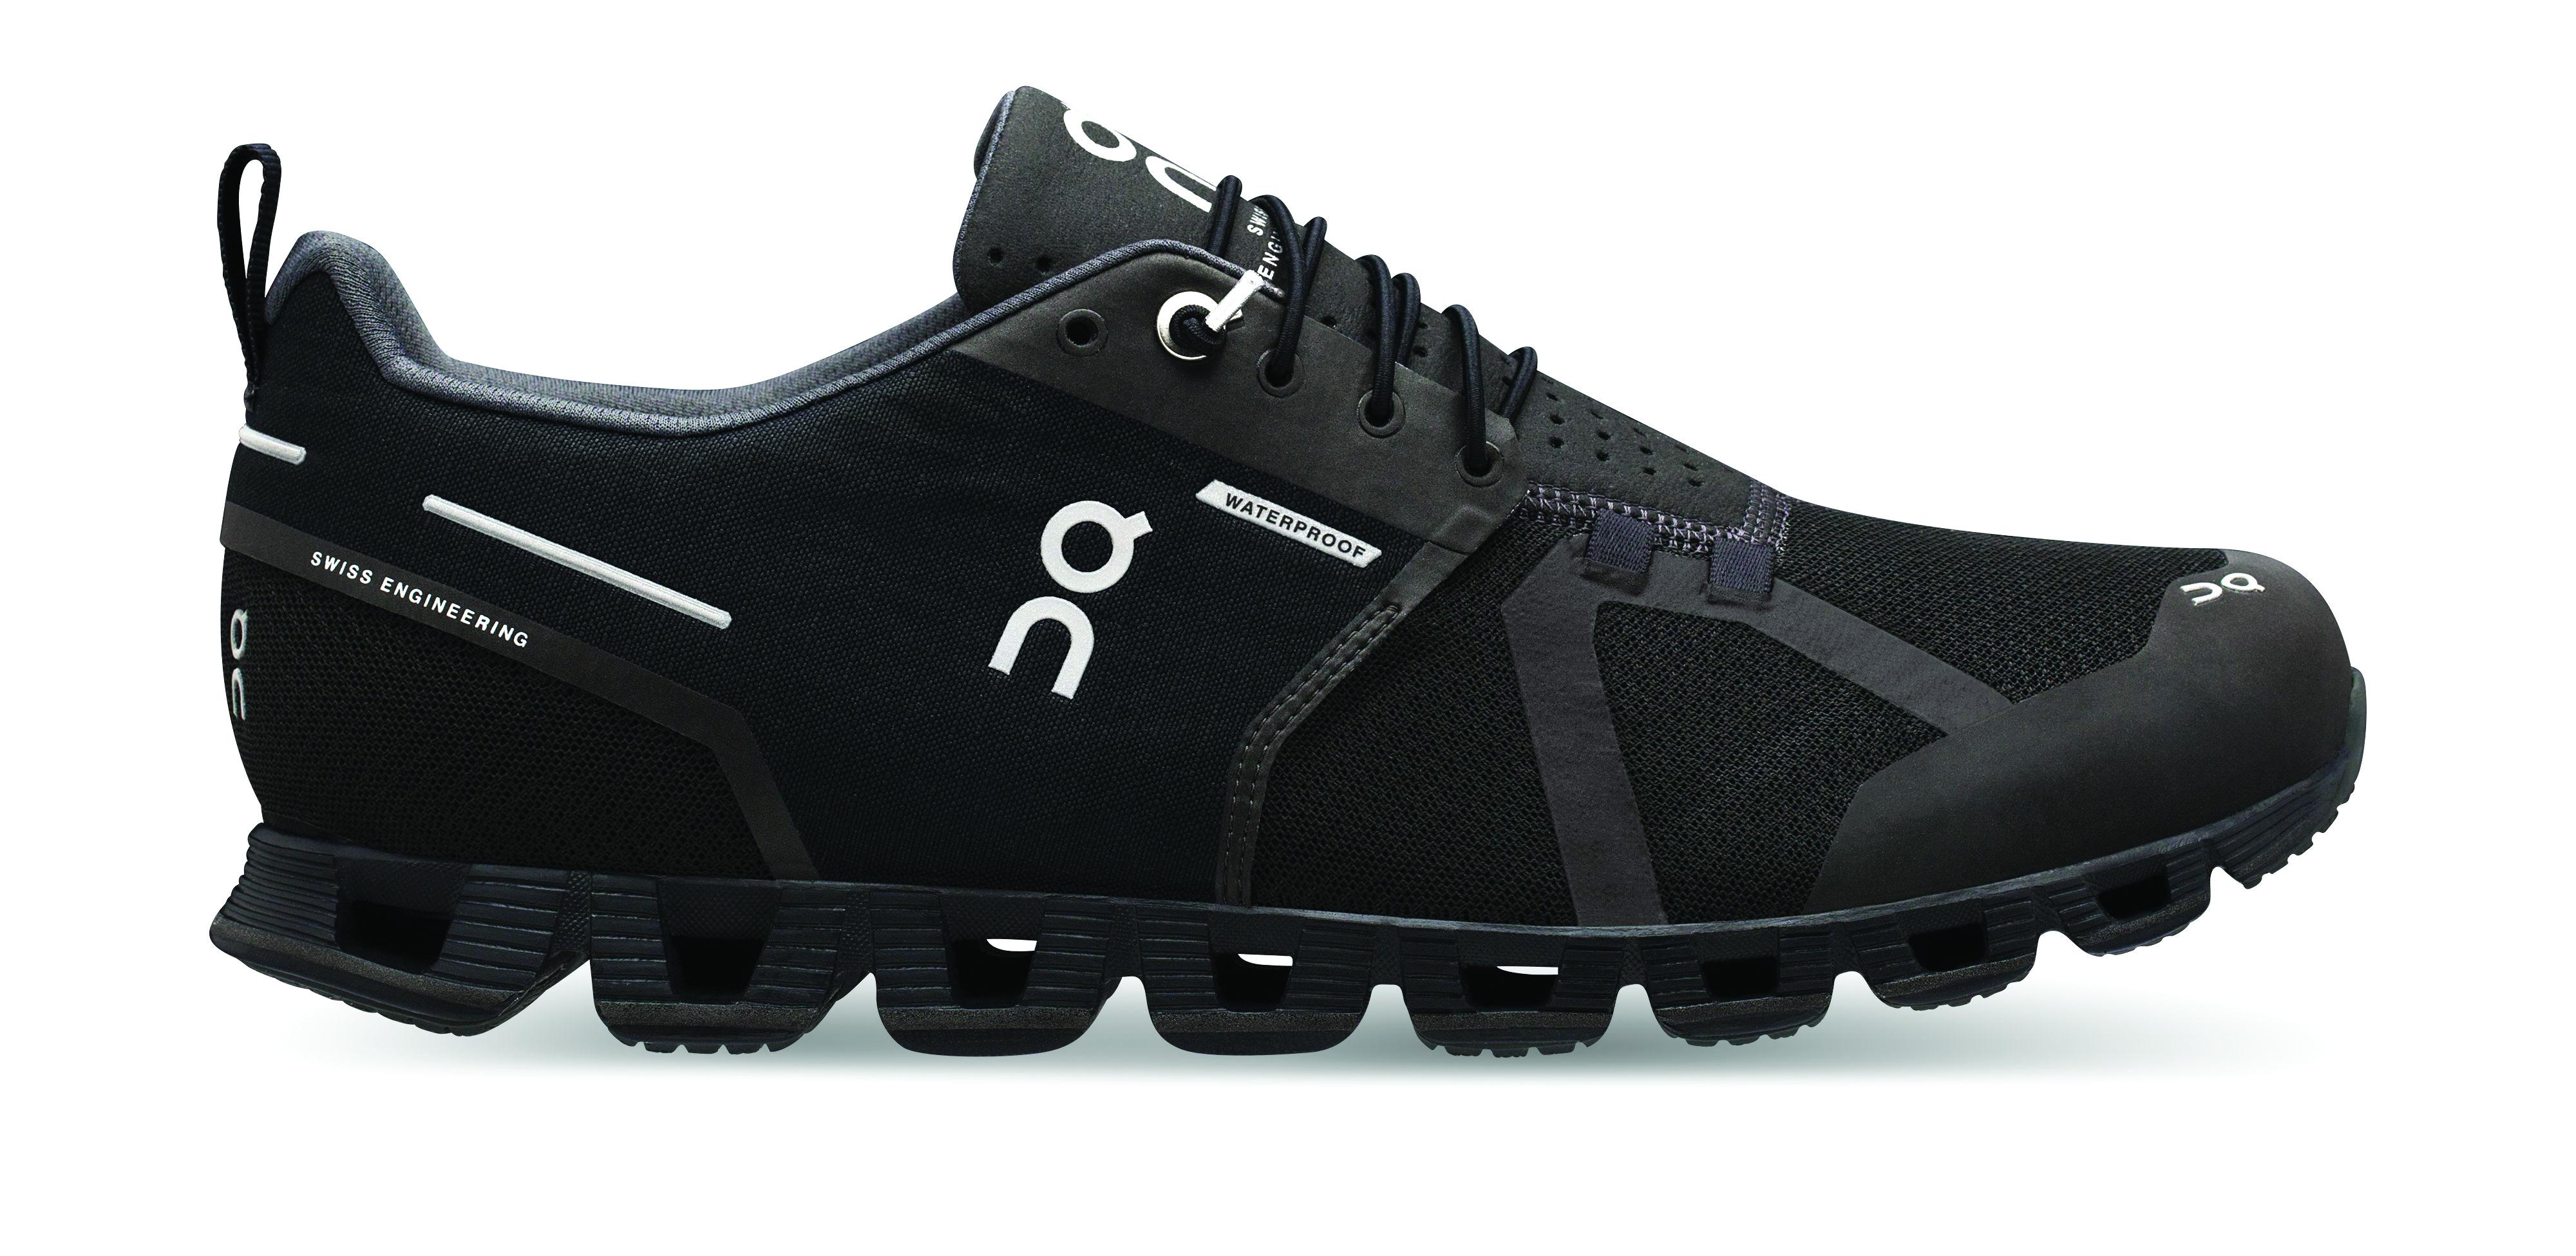 d1f1b0b0550 On Women s The Cloud Waterproof Running Shoes- Black